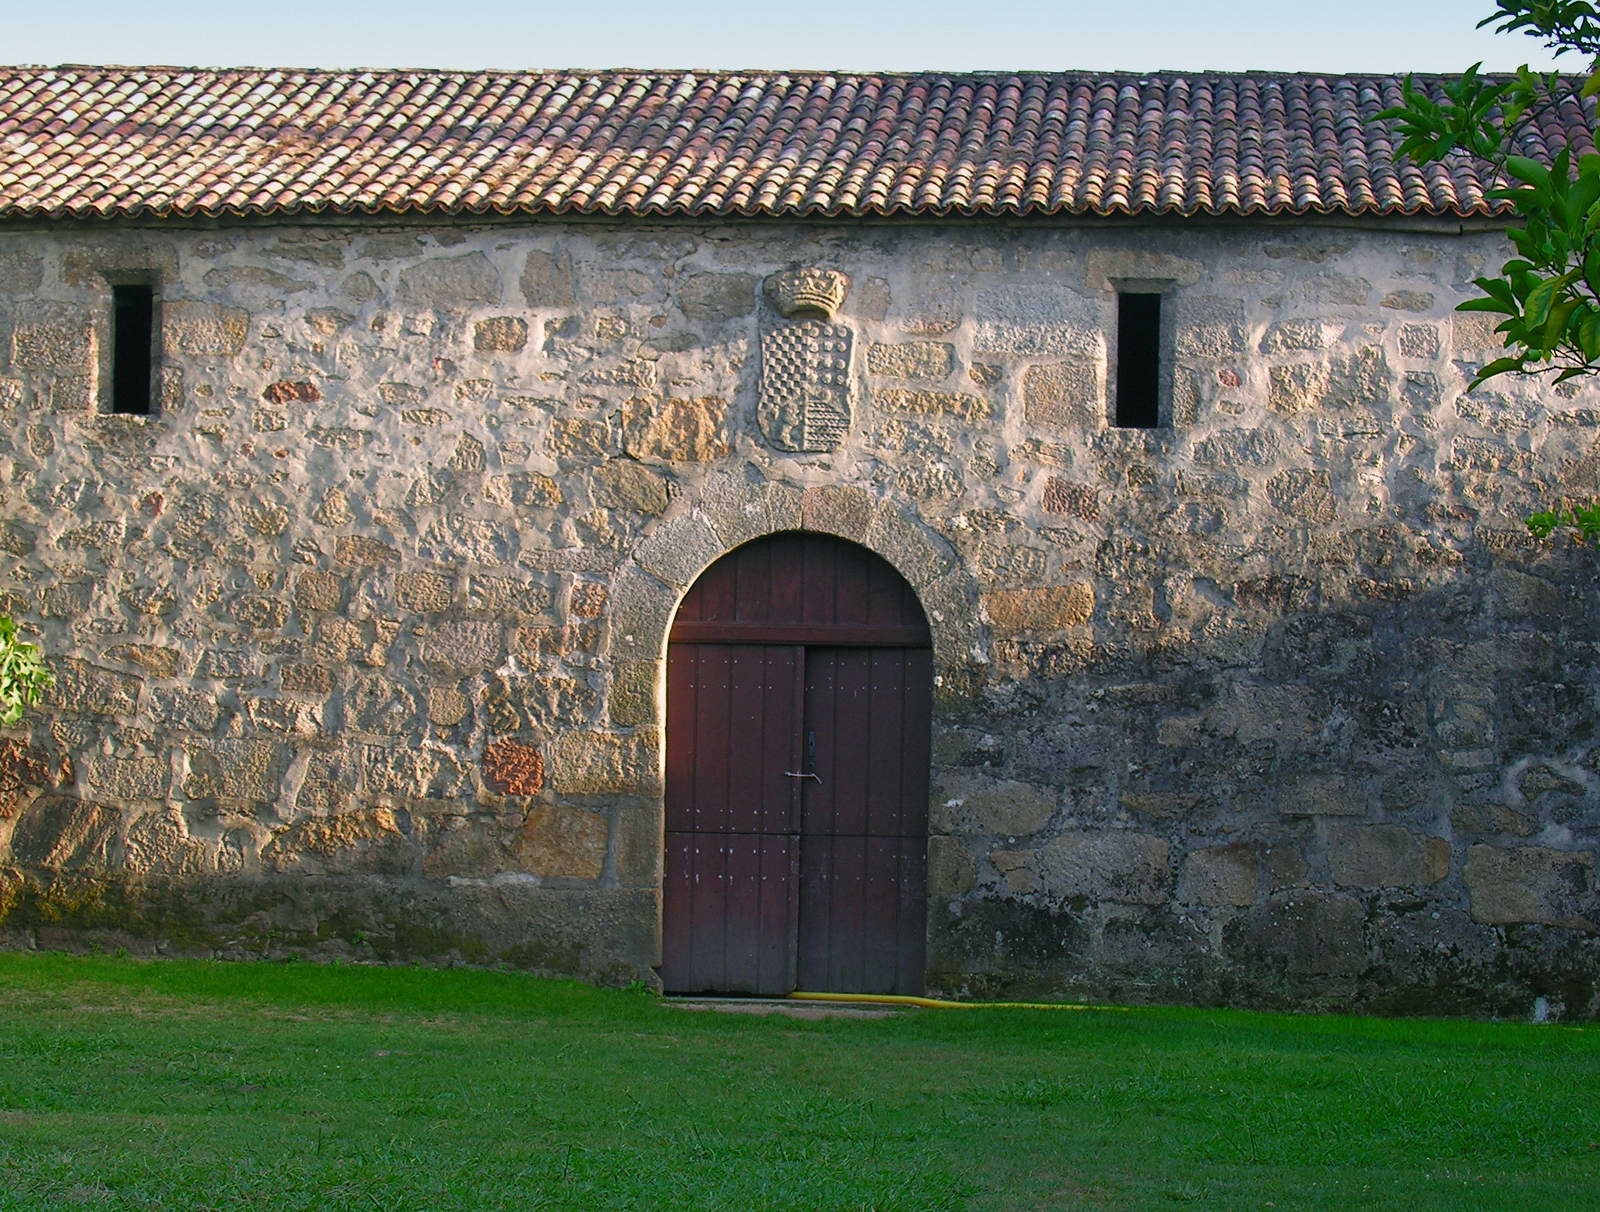 http://upload.wikimedia.org/wikipedia/commons/0/05/Cambados_Pazo_Fefi%C3%B1ans_4.jpg